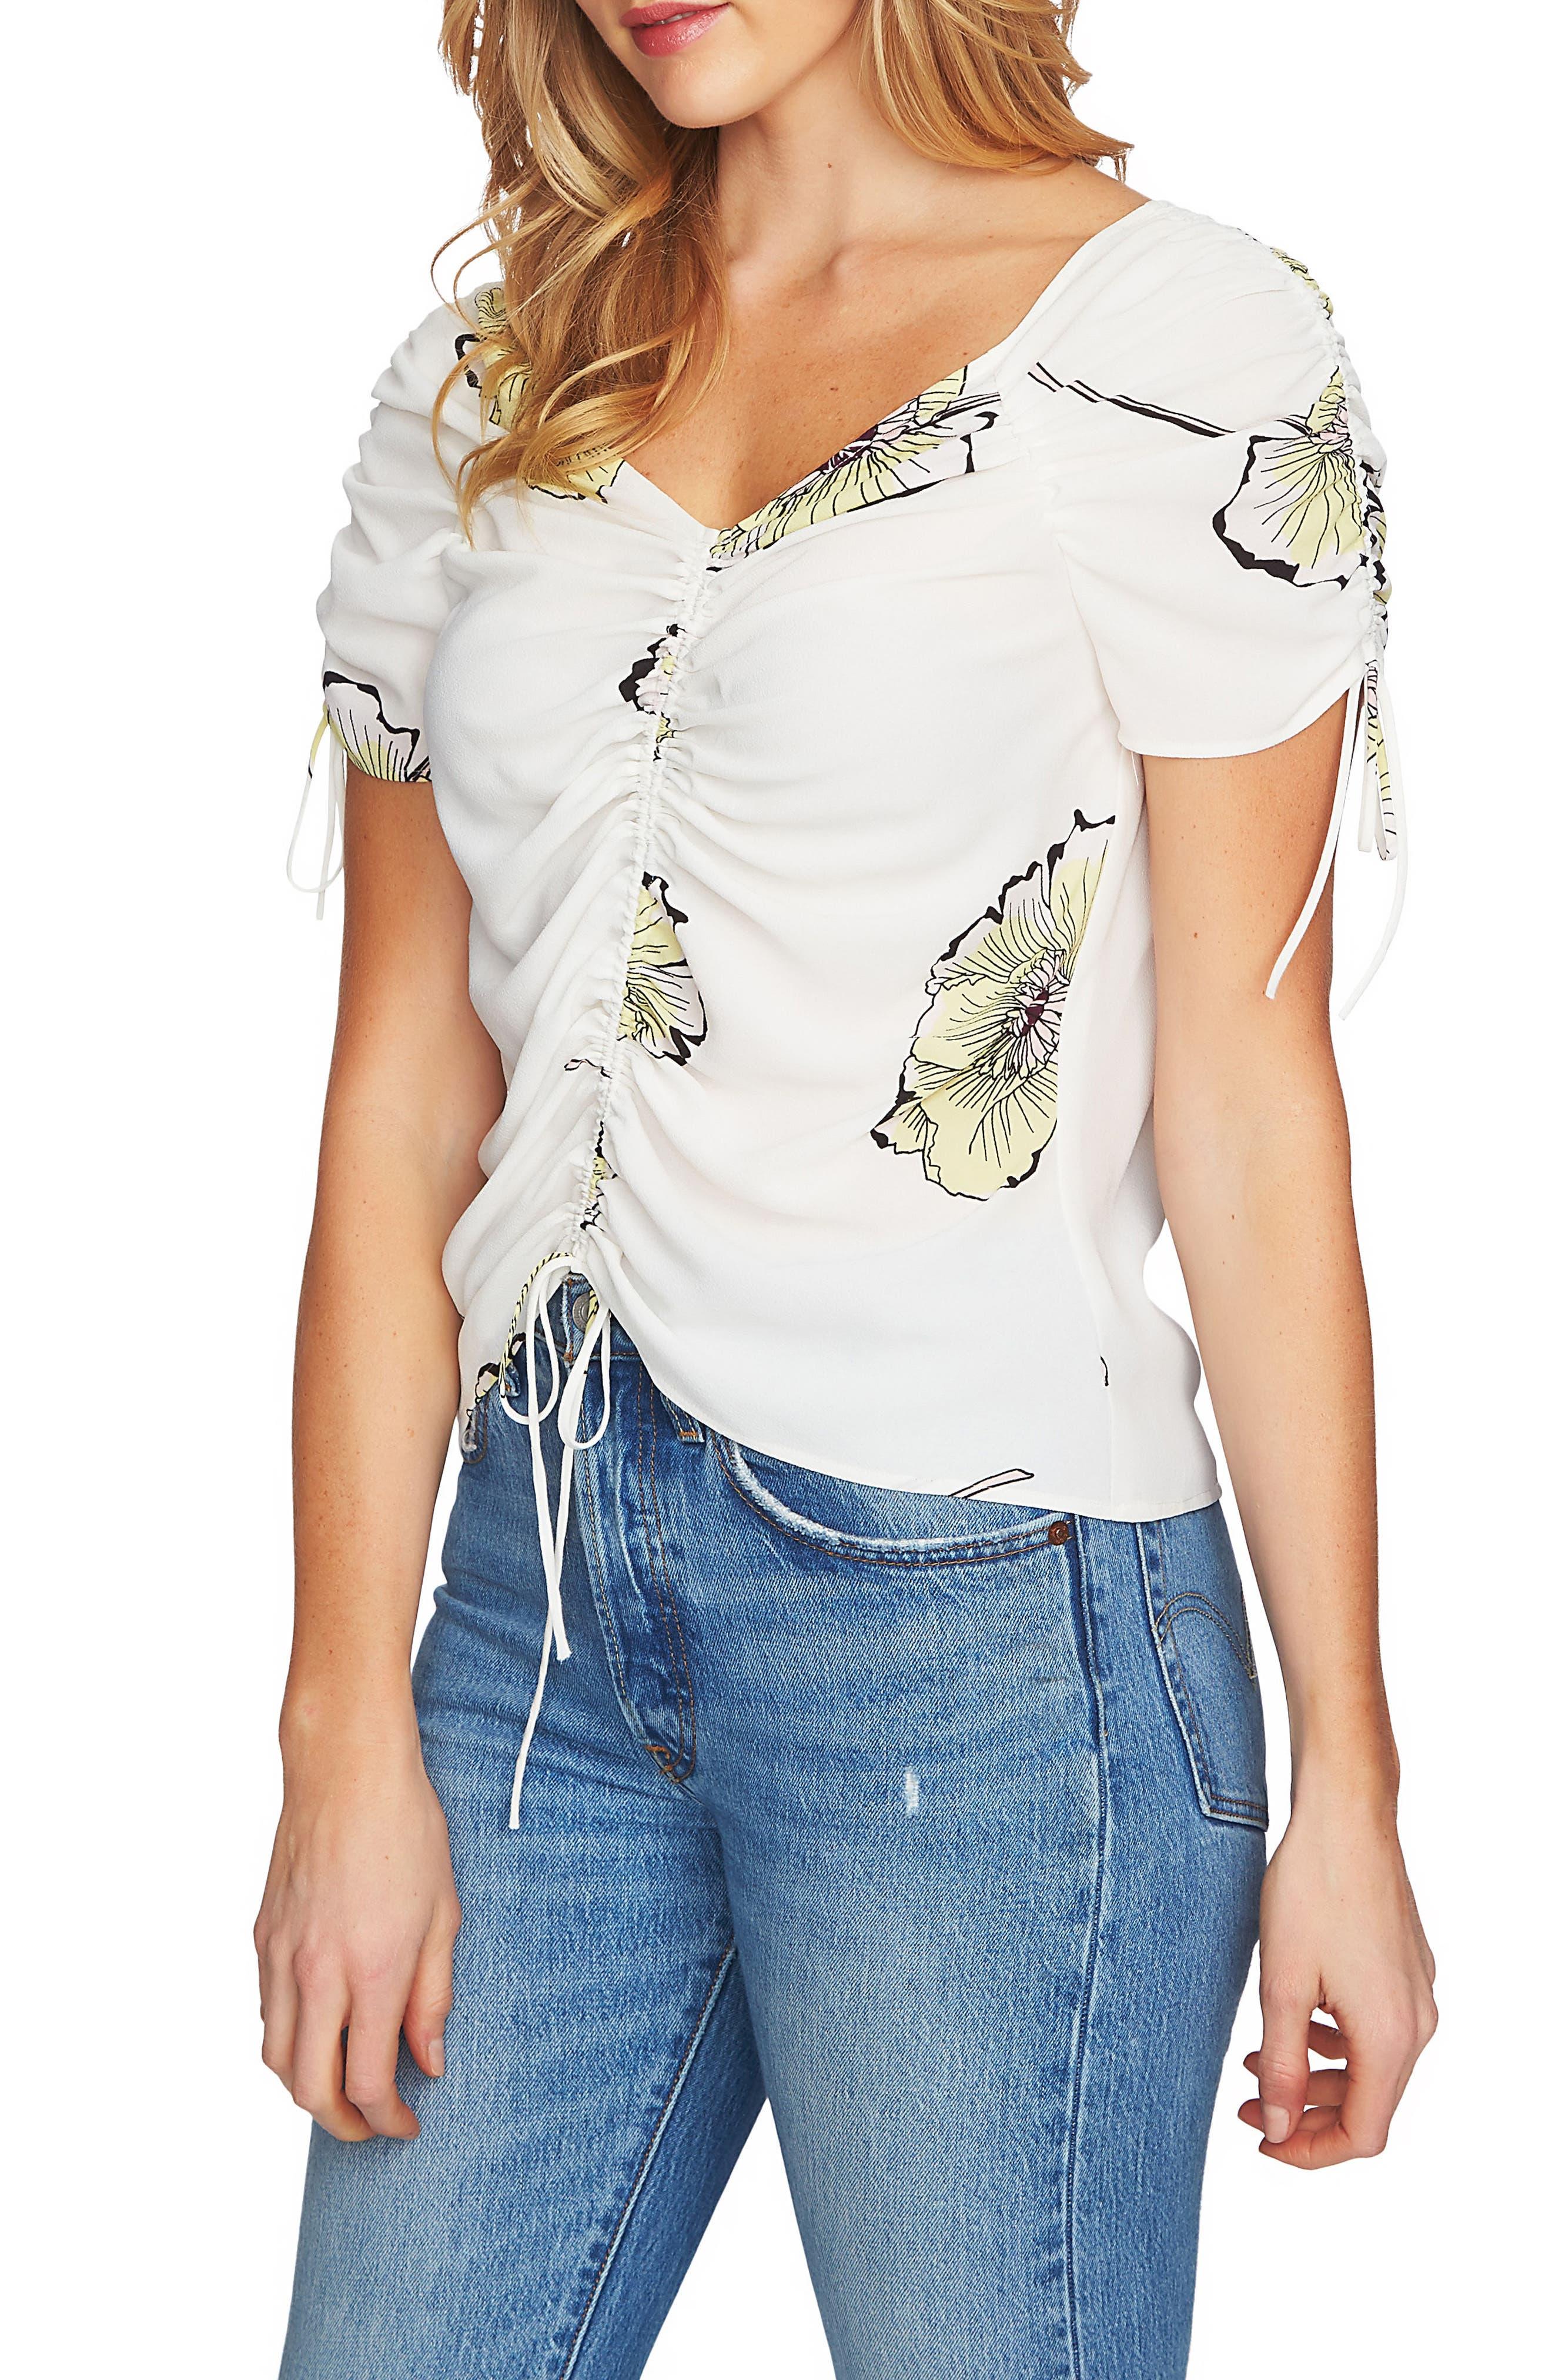 Cinch Blouse,                         Main,                         color, 108-Antiq. White